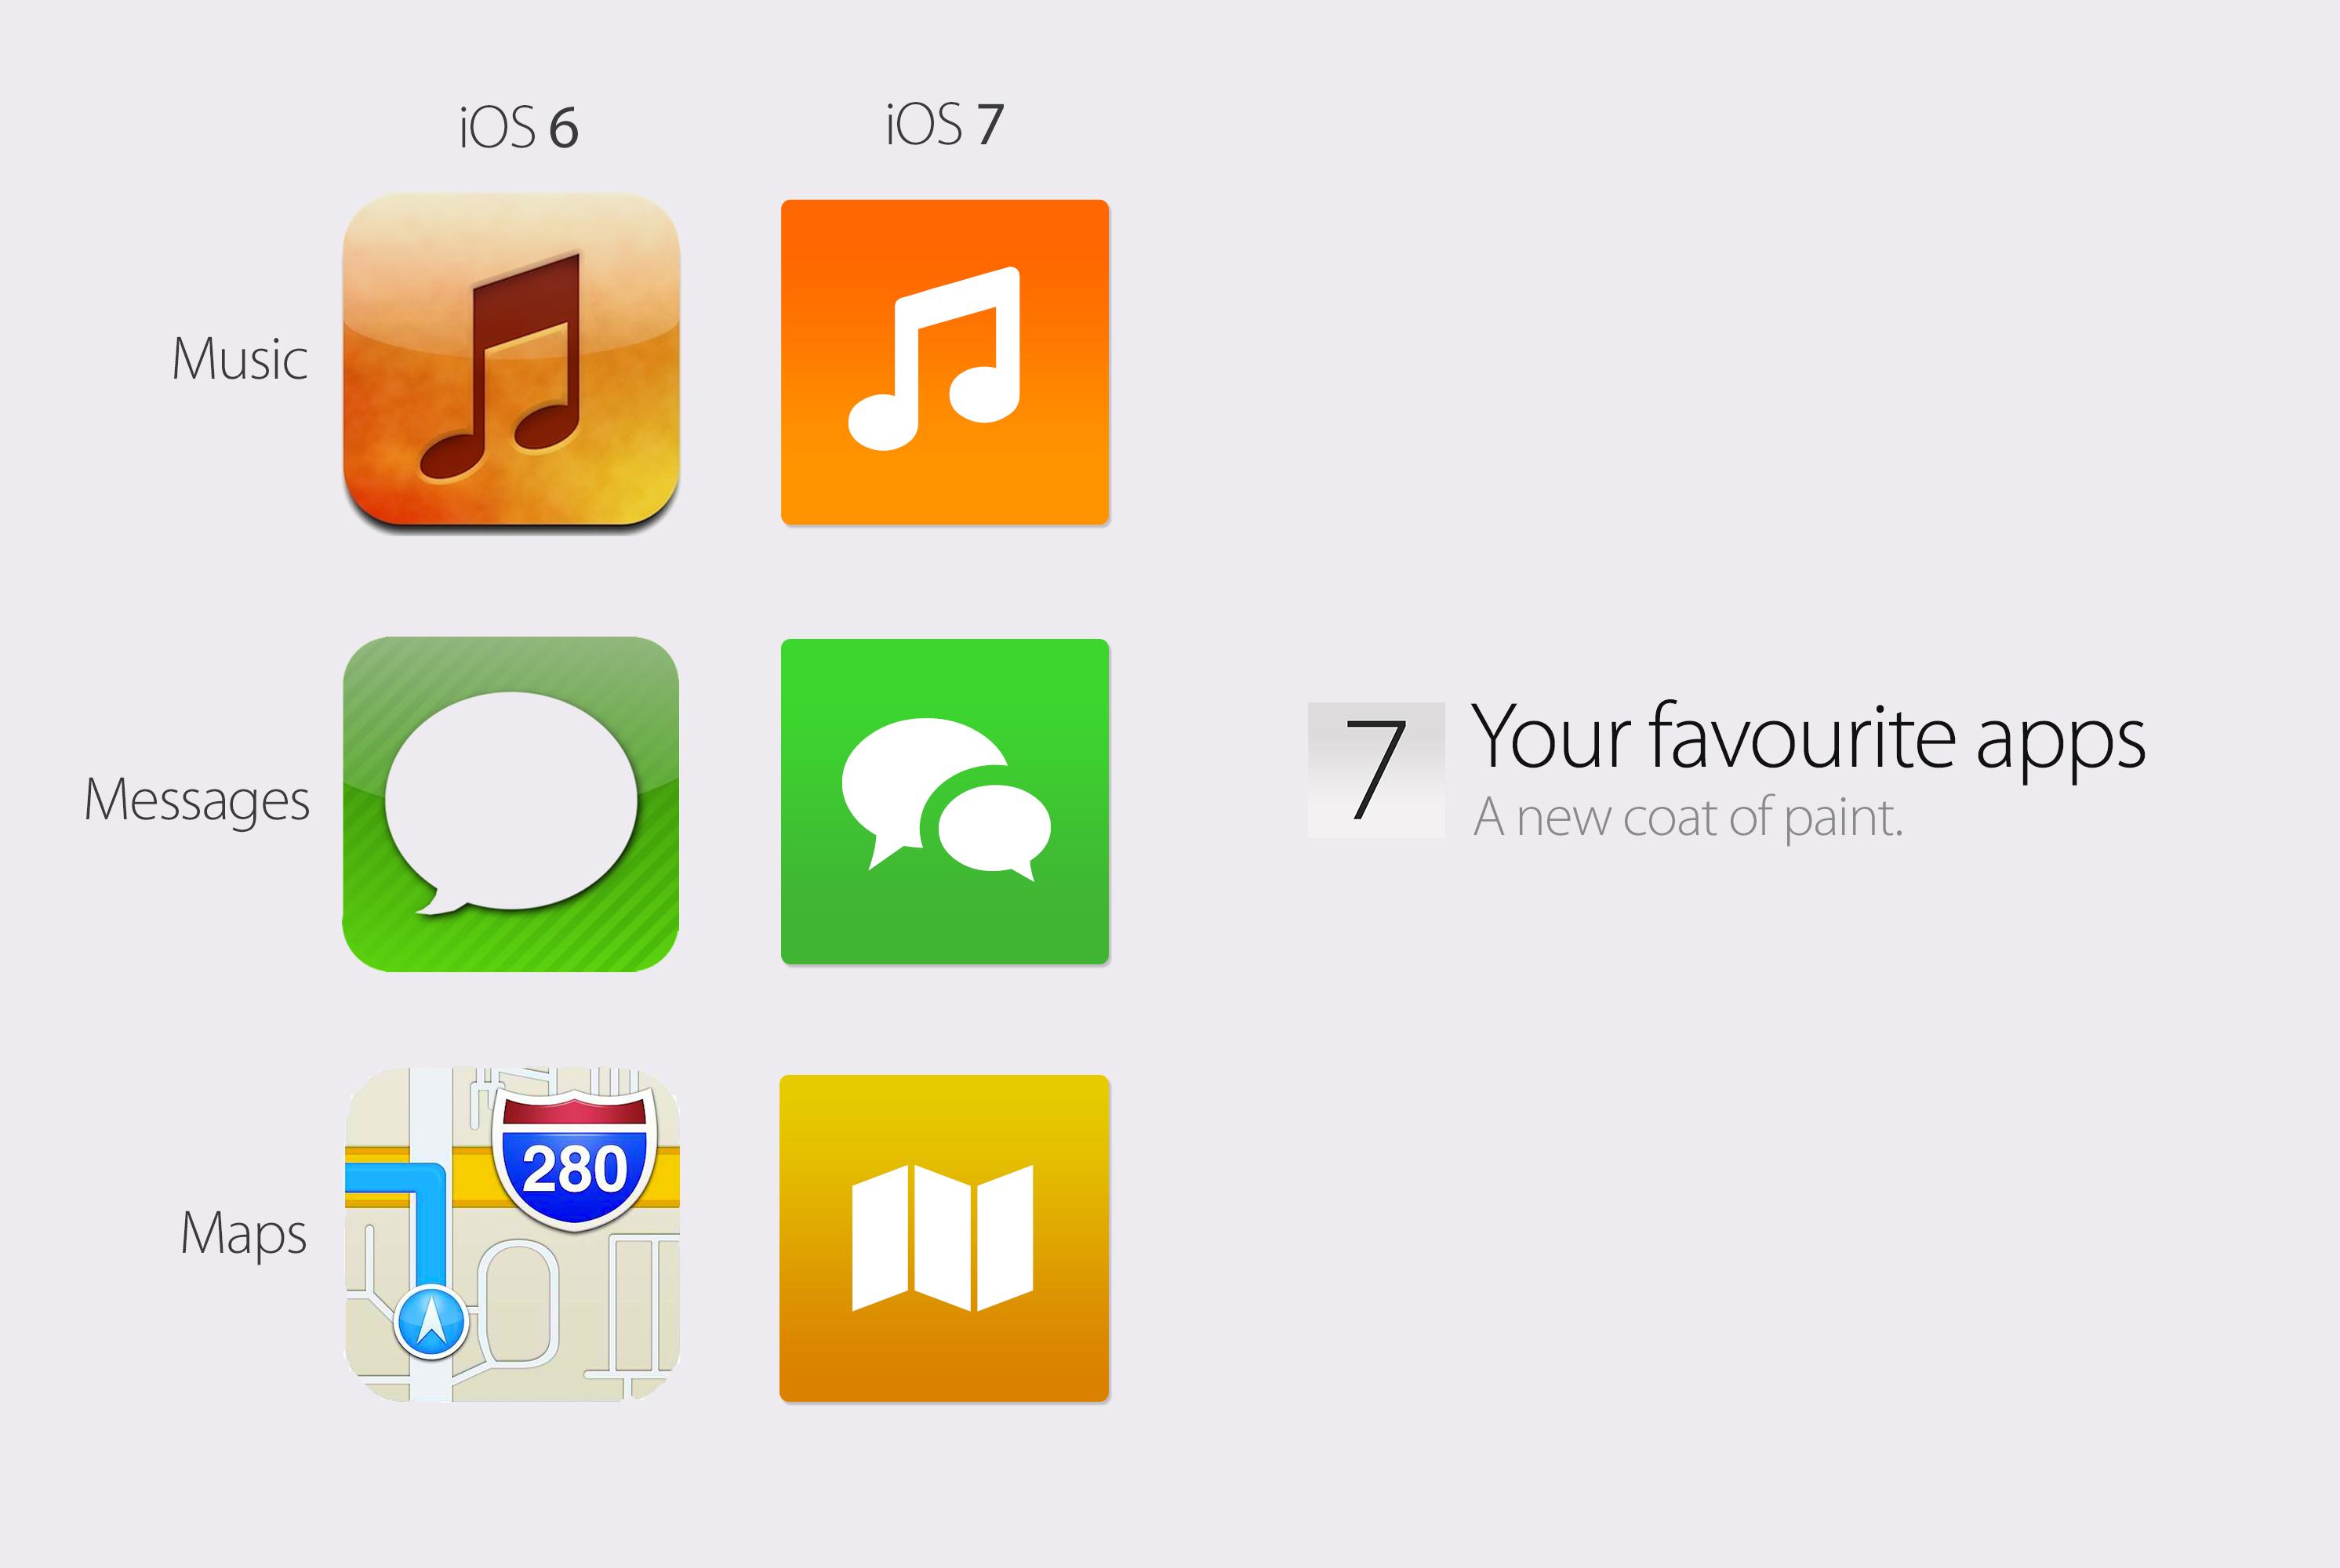 Conceito para iOS 7 - Simply Zesty